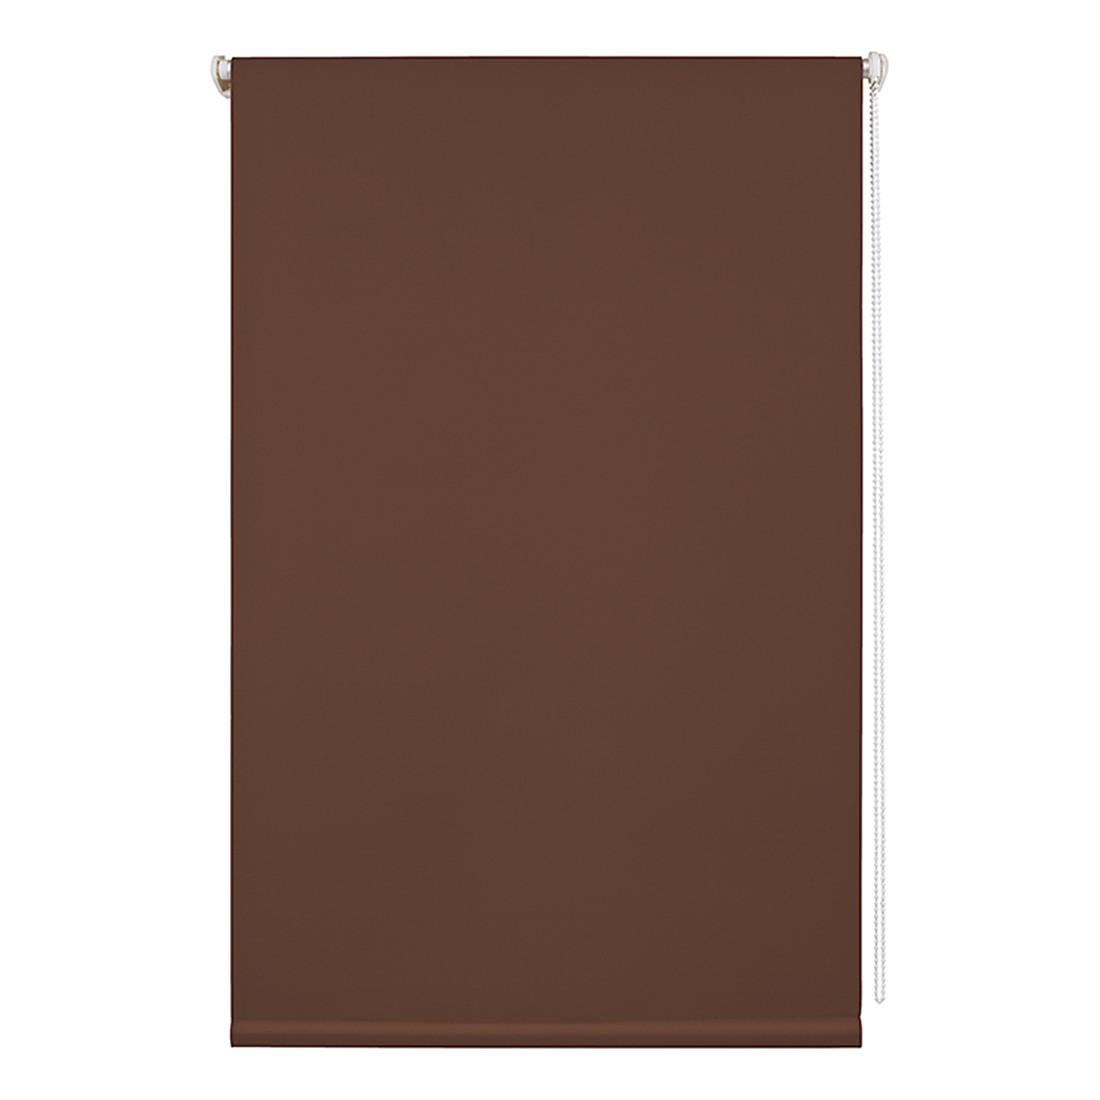 Rollo Klemmfix, Thermo/Verdunkelung – Polyester, Braun – Abmessungen (H x B): 150 x 90 cm, Wohn-Guide bestellen